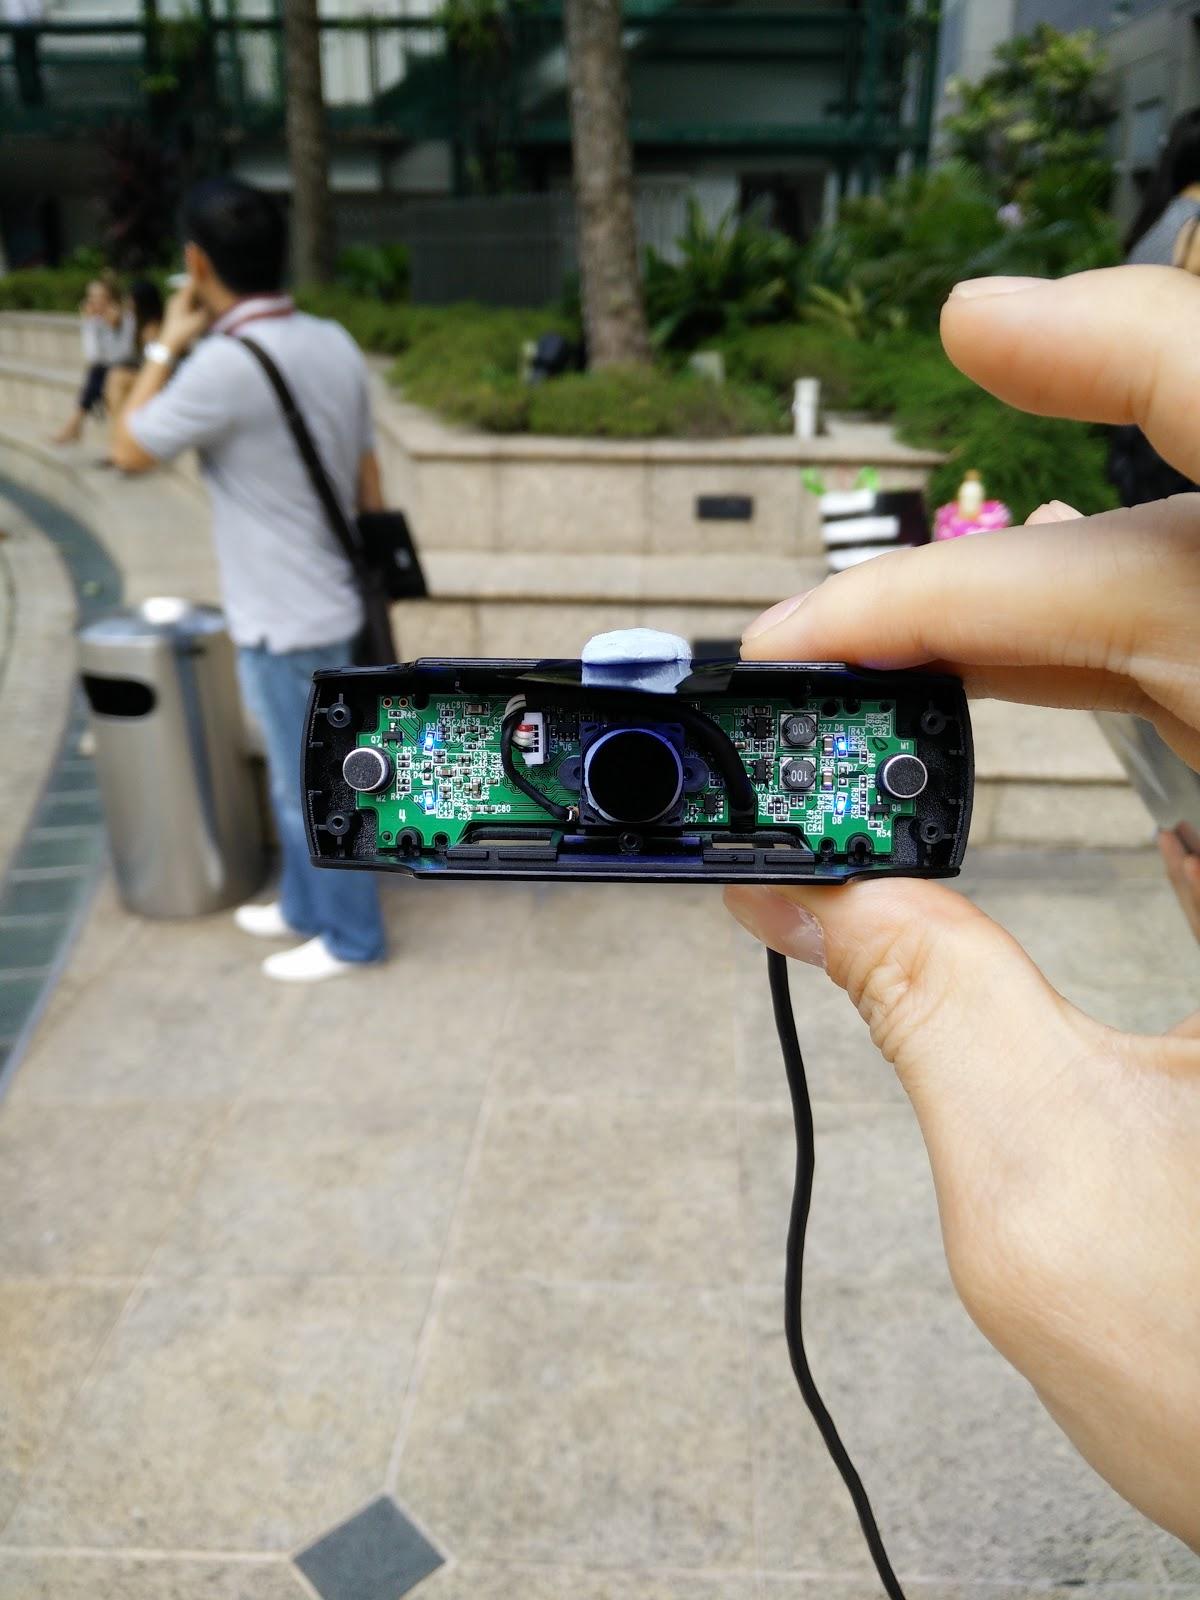 Hack a normal camera into a UV camera | The Evolution of